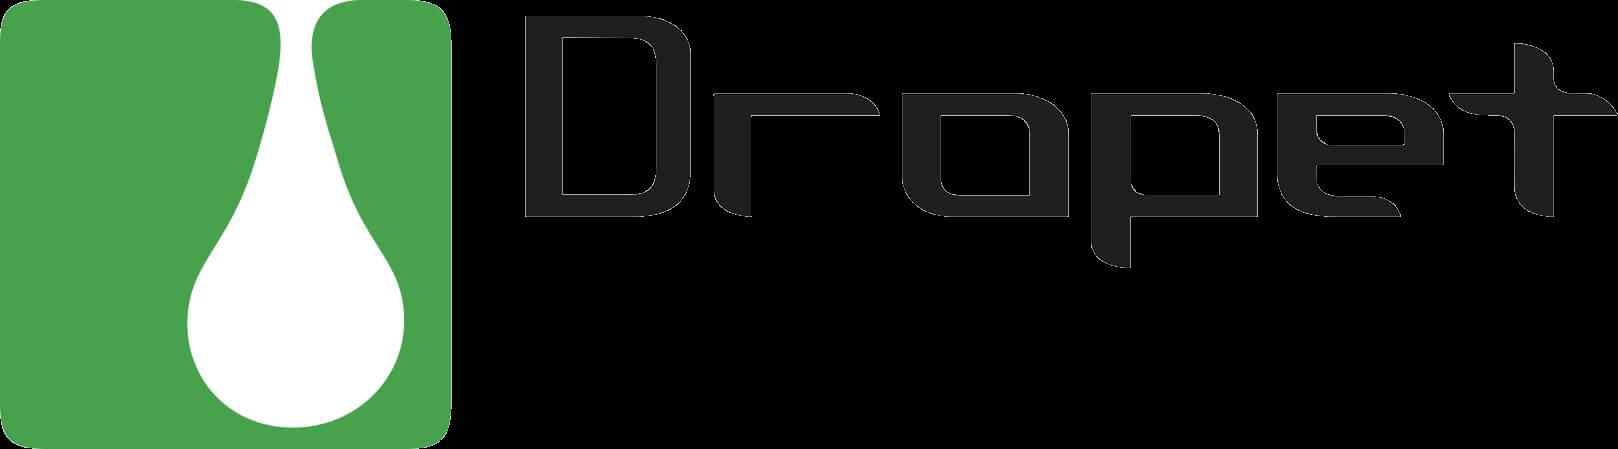 Dropet